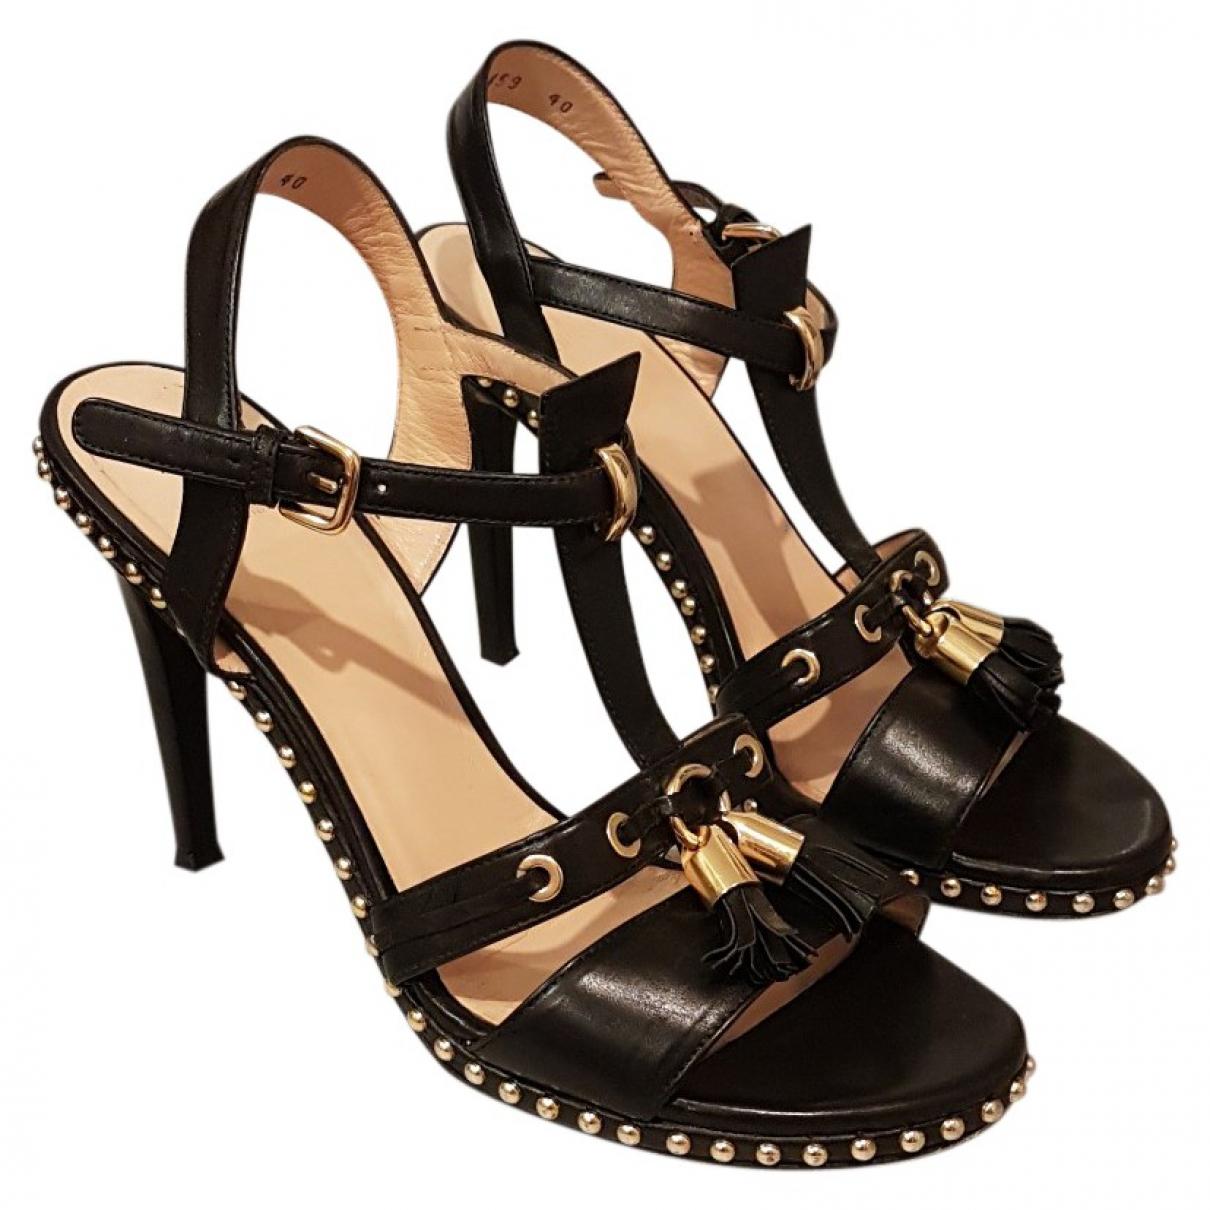 Stuart Weitzman \N Black Leather Sandals for Women 40.5 EU